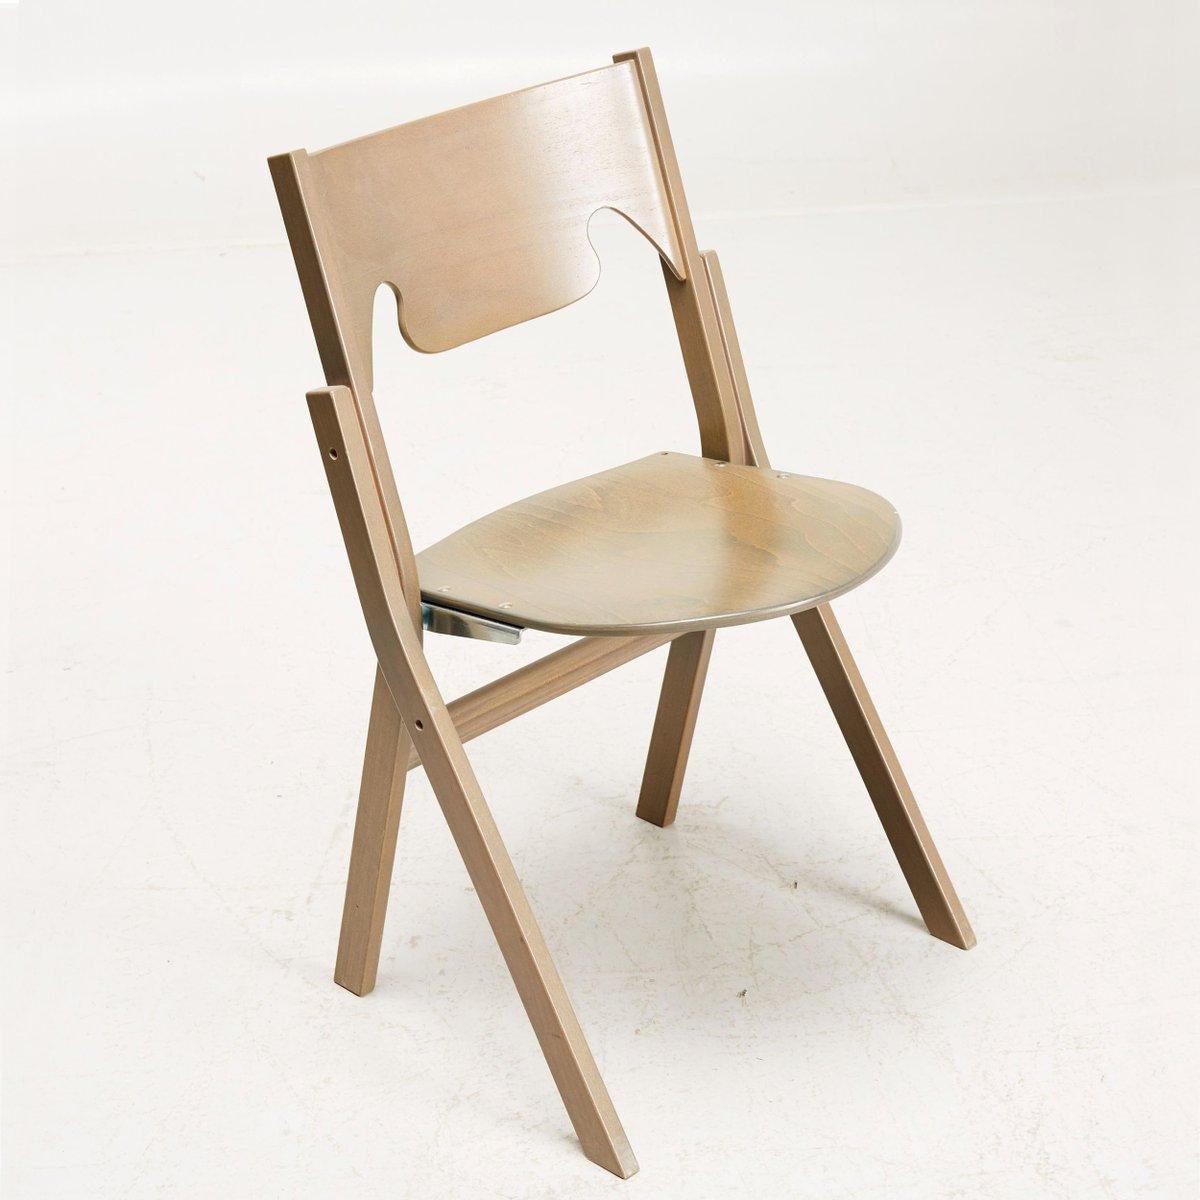 Modern Folding Chairs  LeisureMod Milden Modern Acrylic